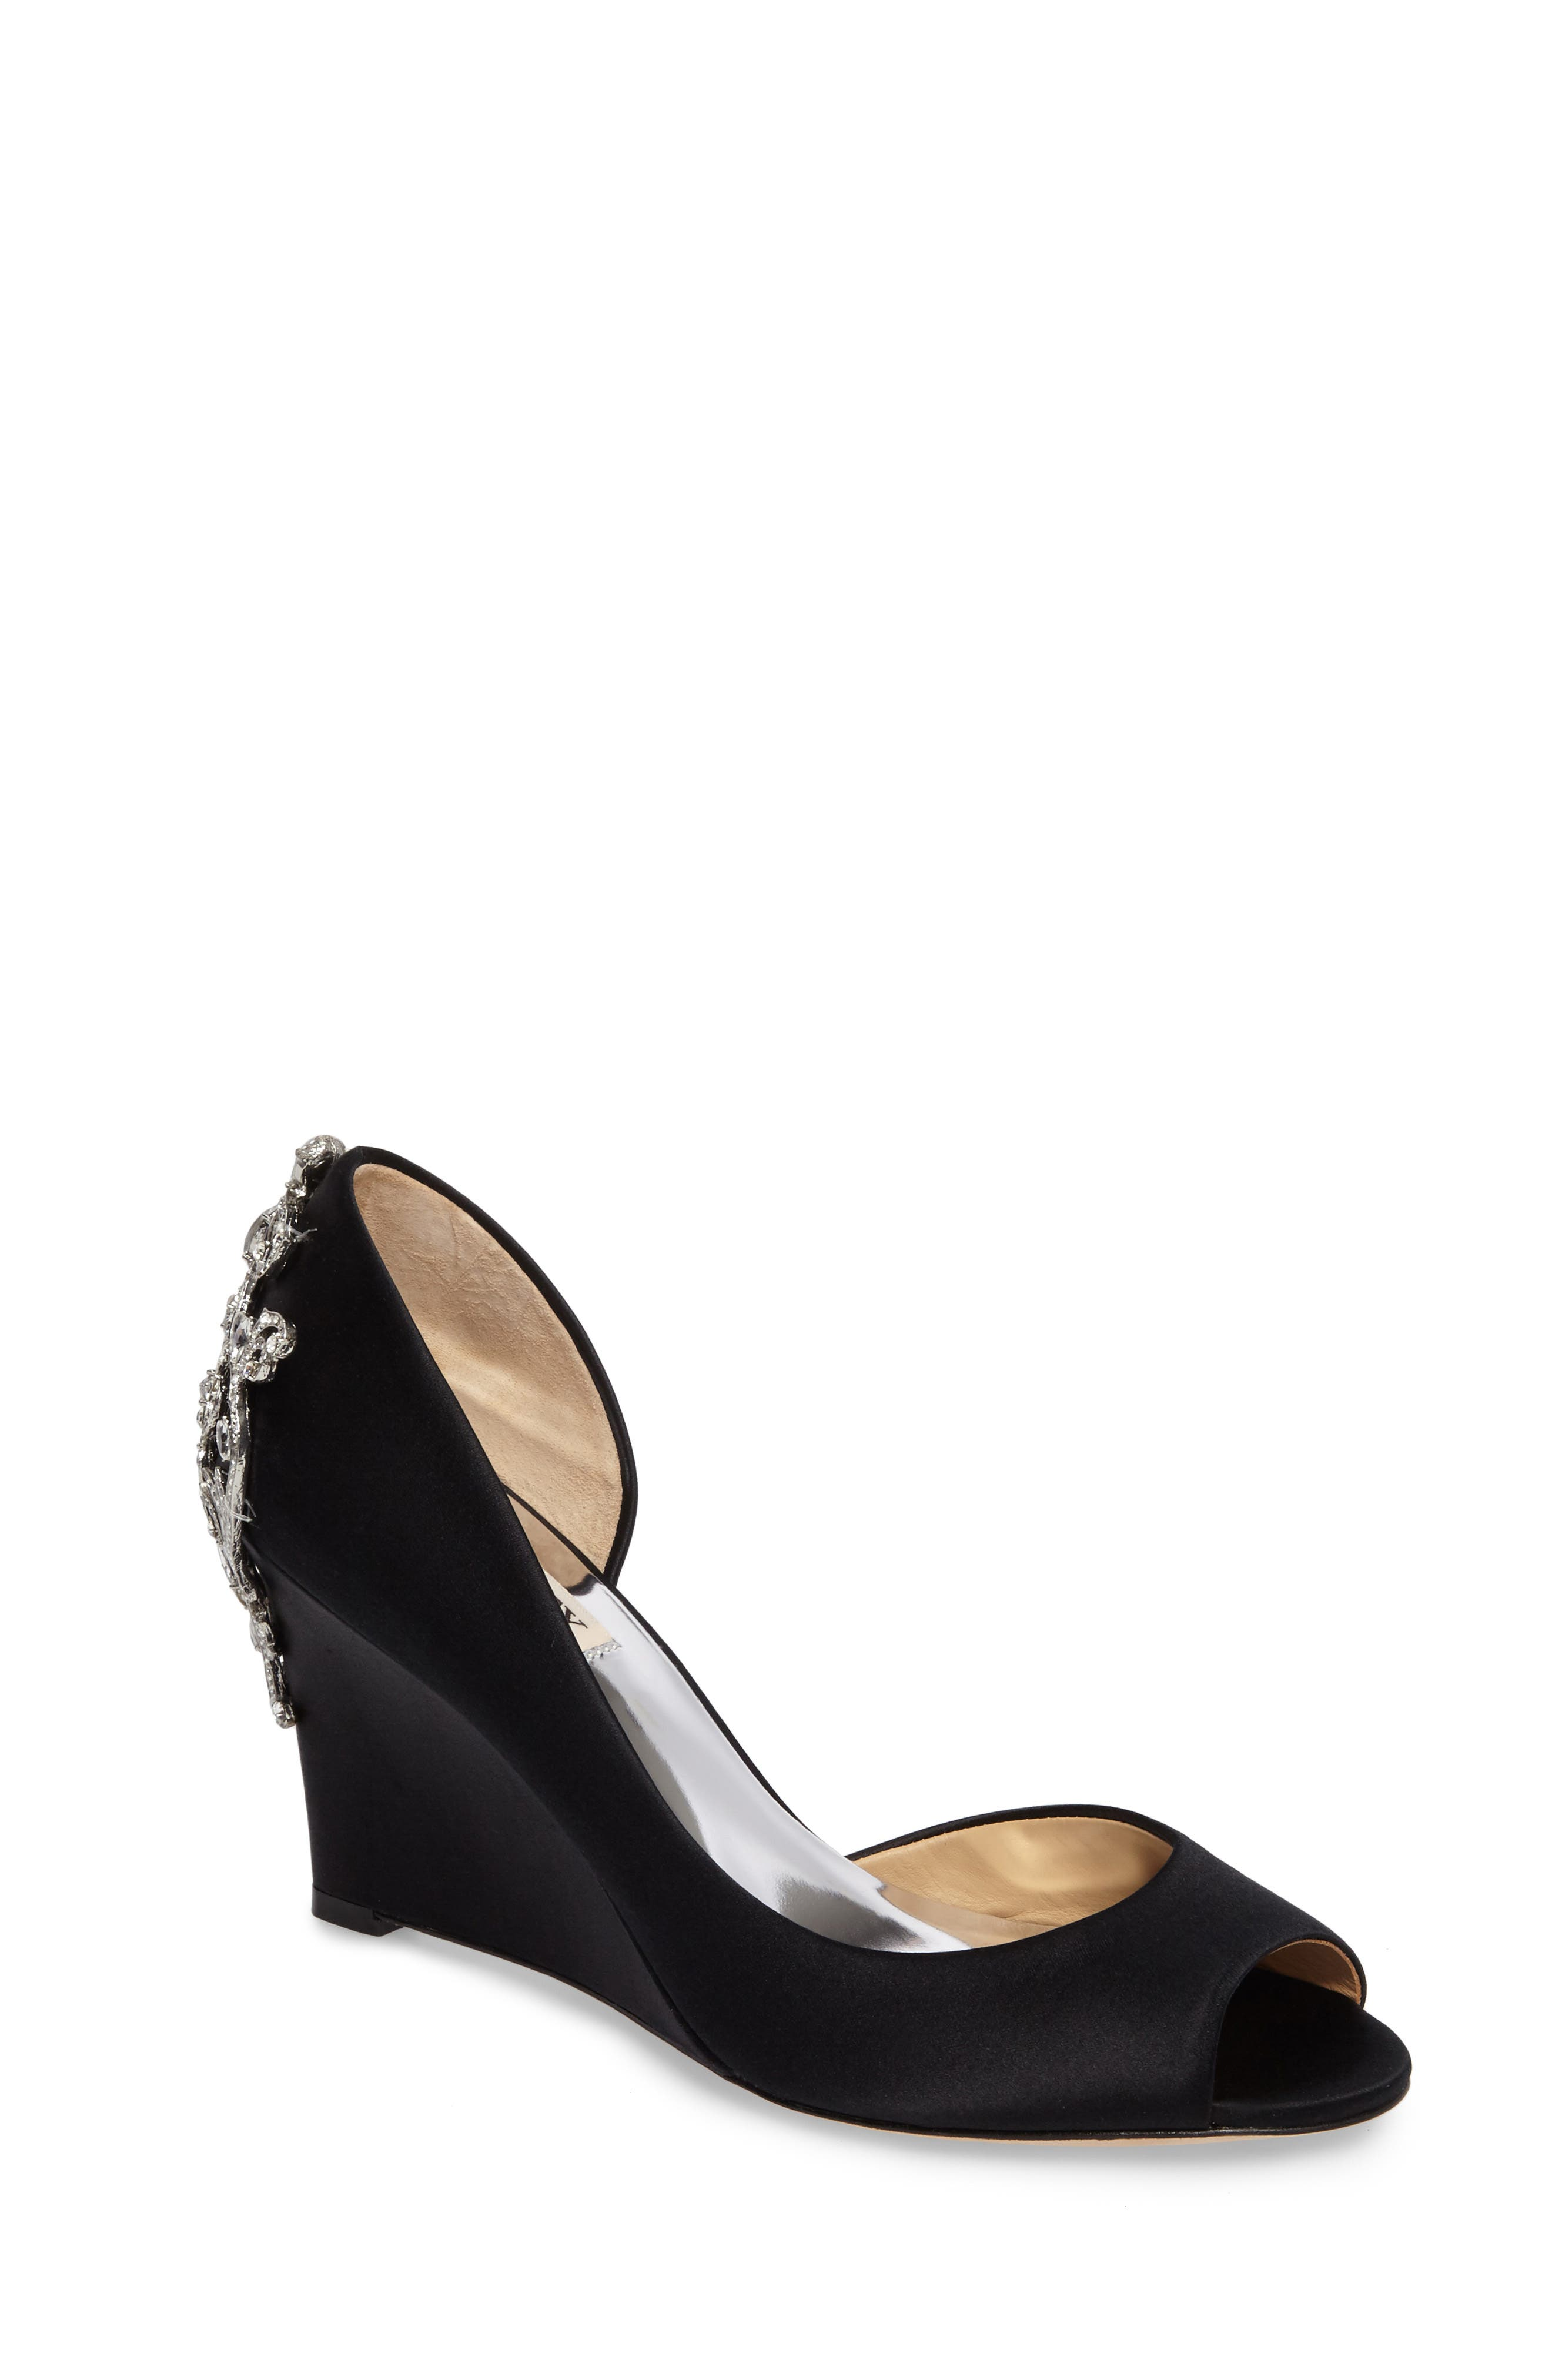 Alternate Image 1 Selected - Badgley Mischka Meagan Embellished Peep Toe Wedge (Women)